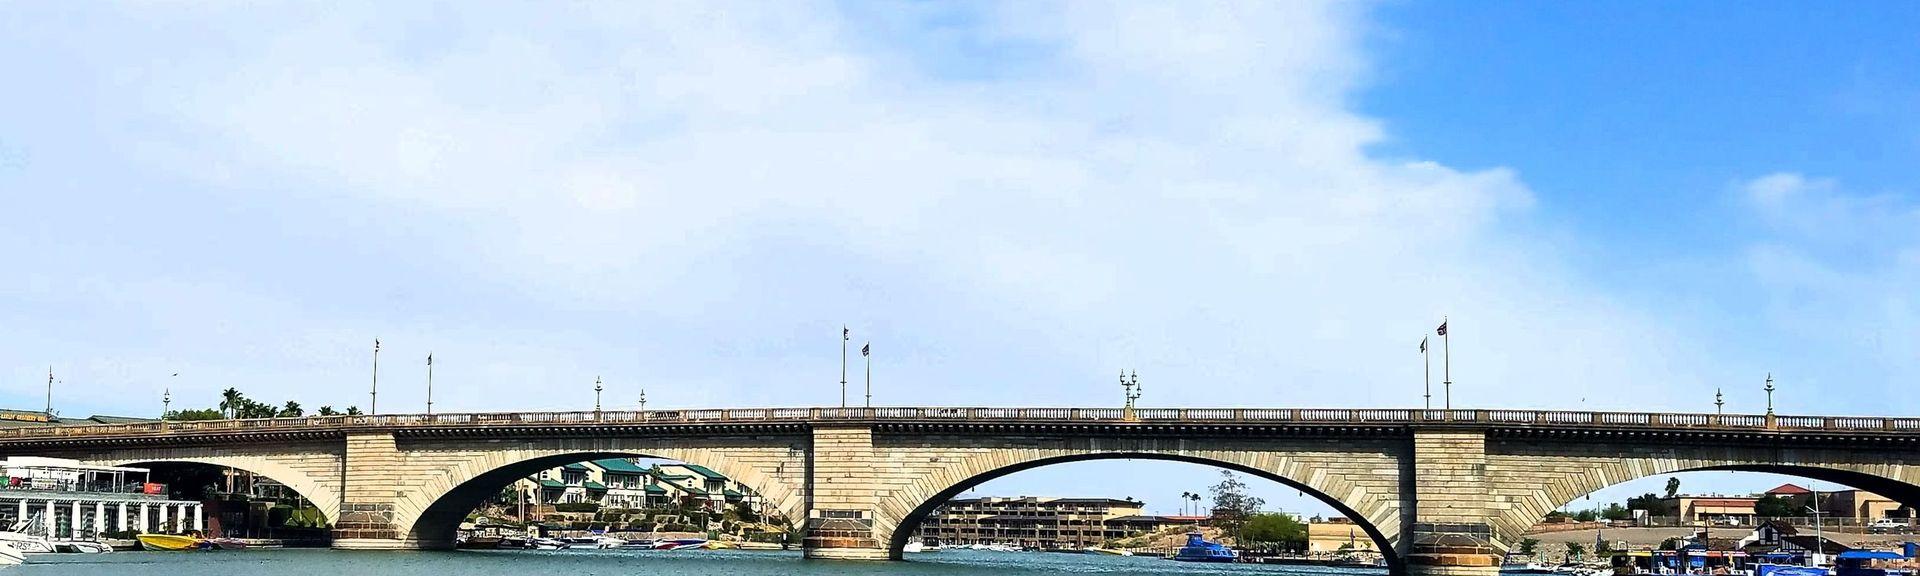 London Bridge, Lake Havasu City, AZ, USA